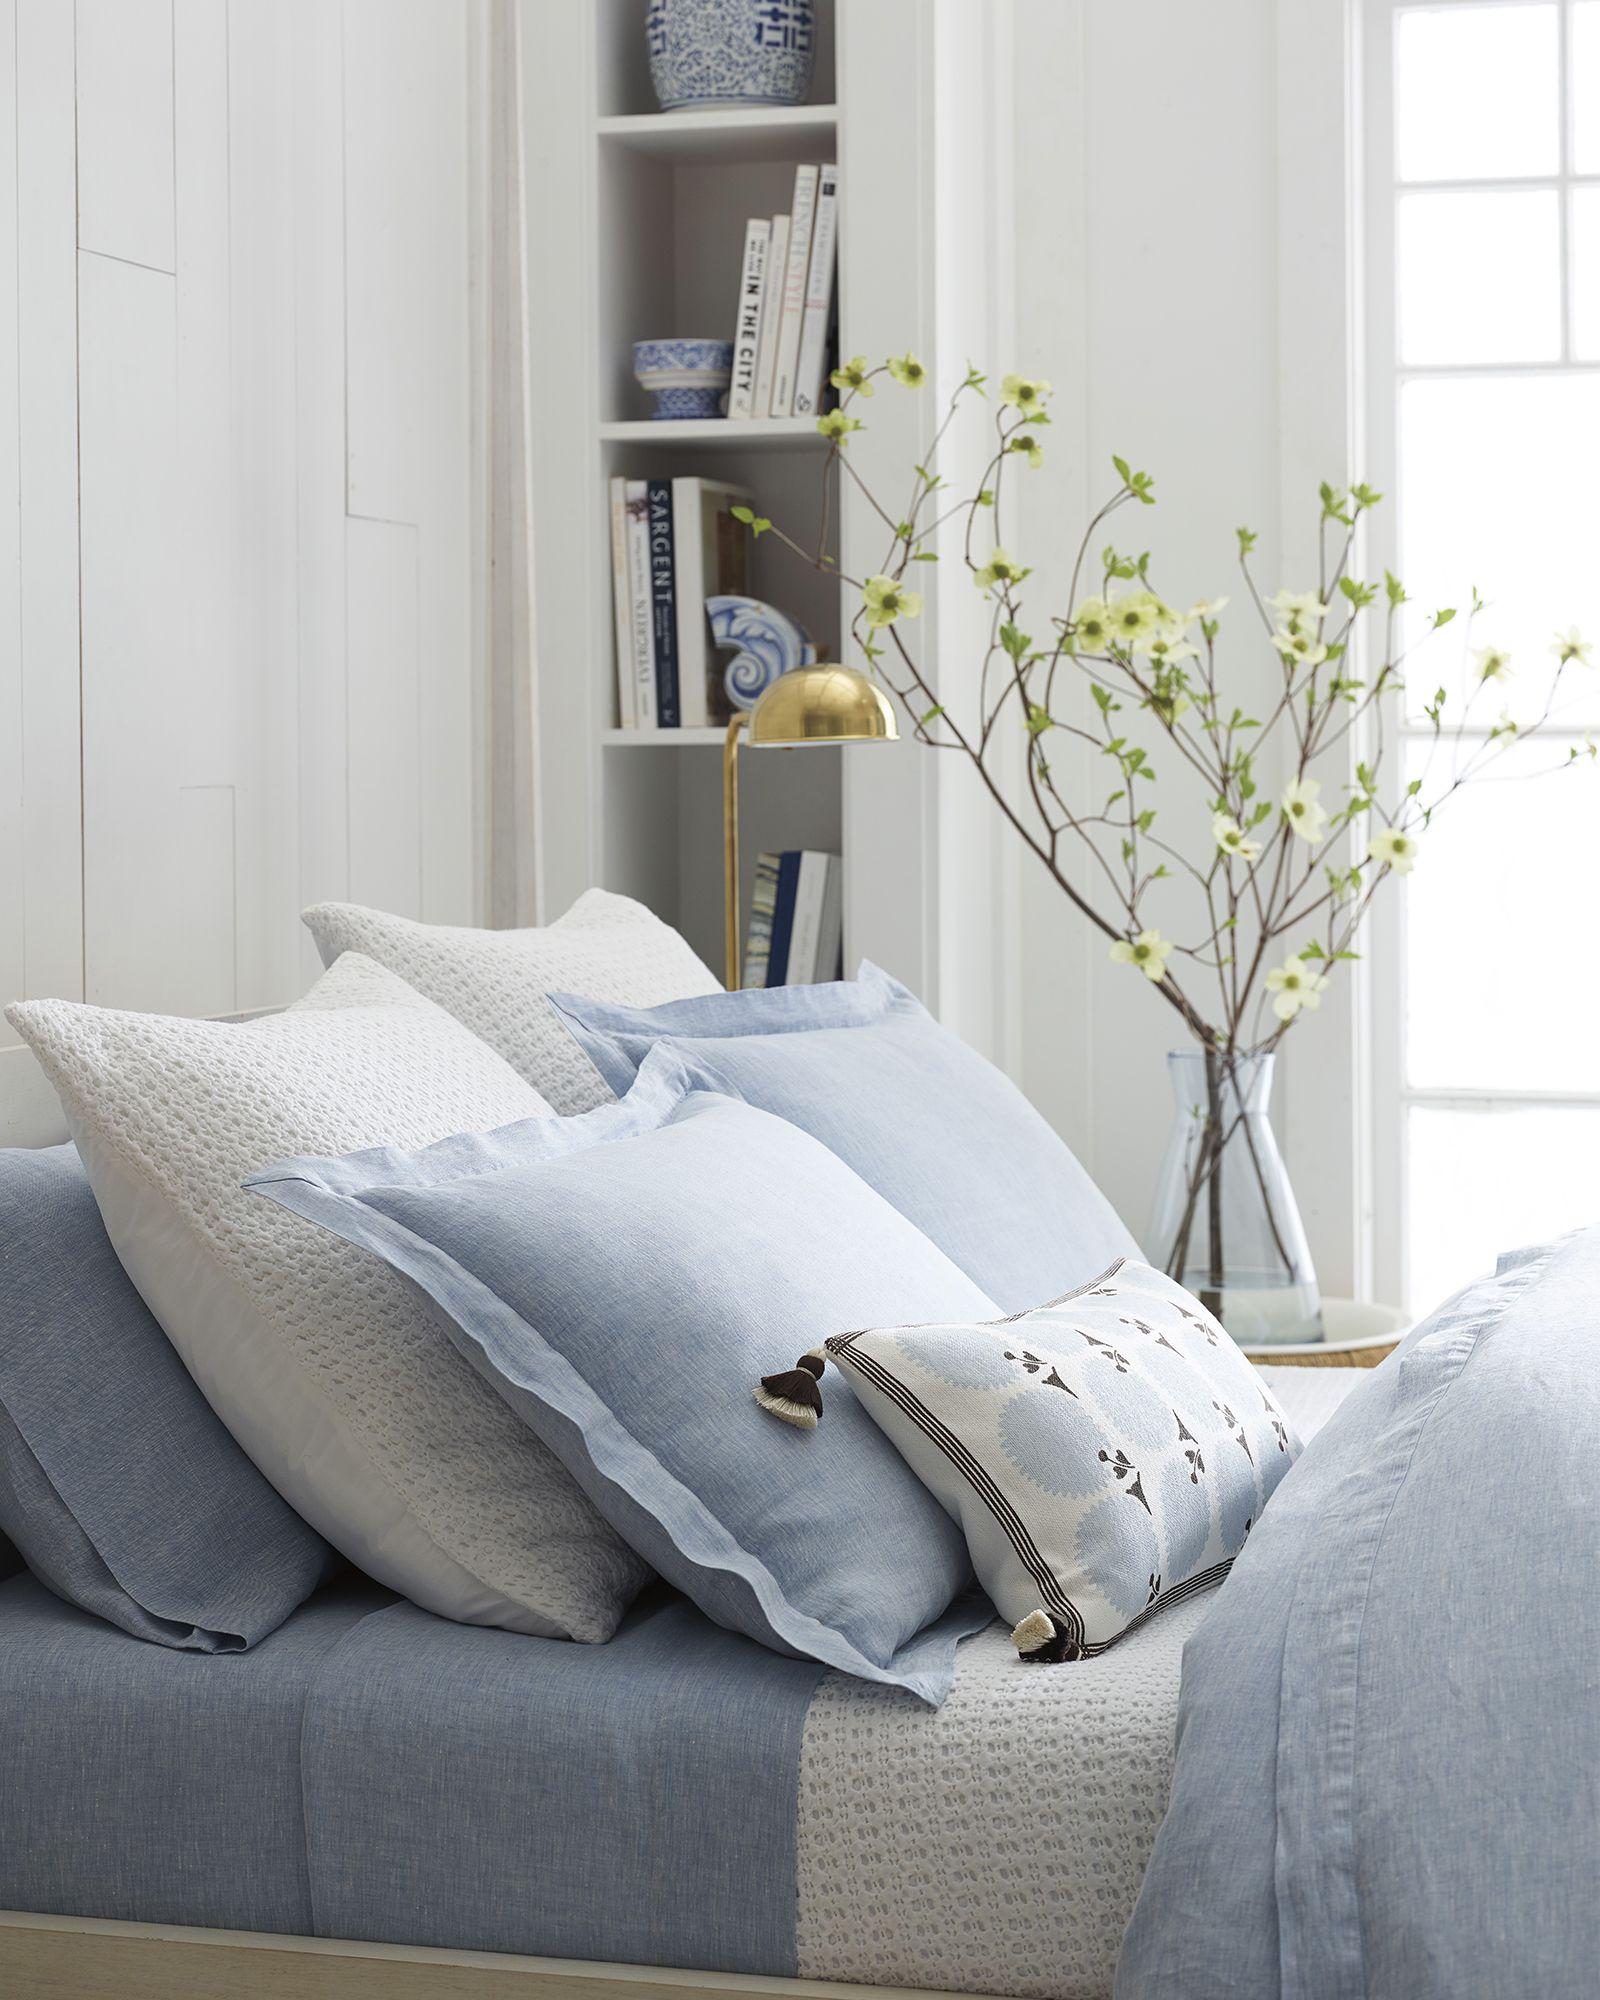 birchwood pillow cover beautiful bedrooms in 2018 pinterest rh pinterest com